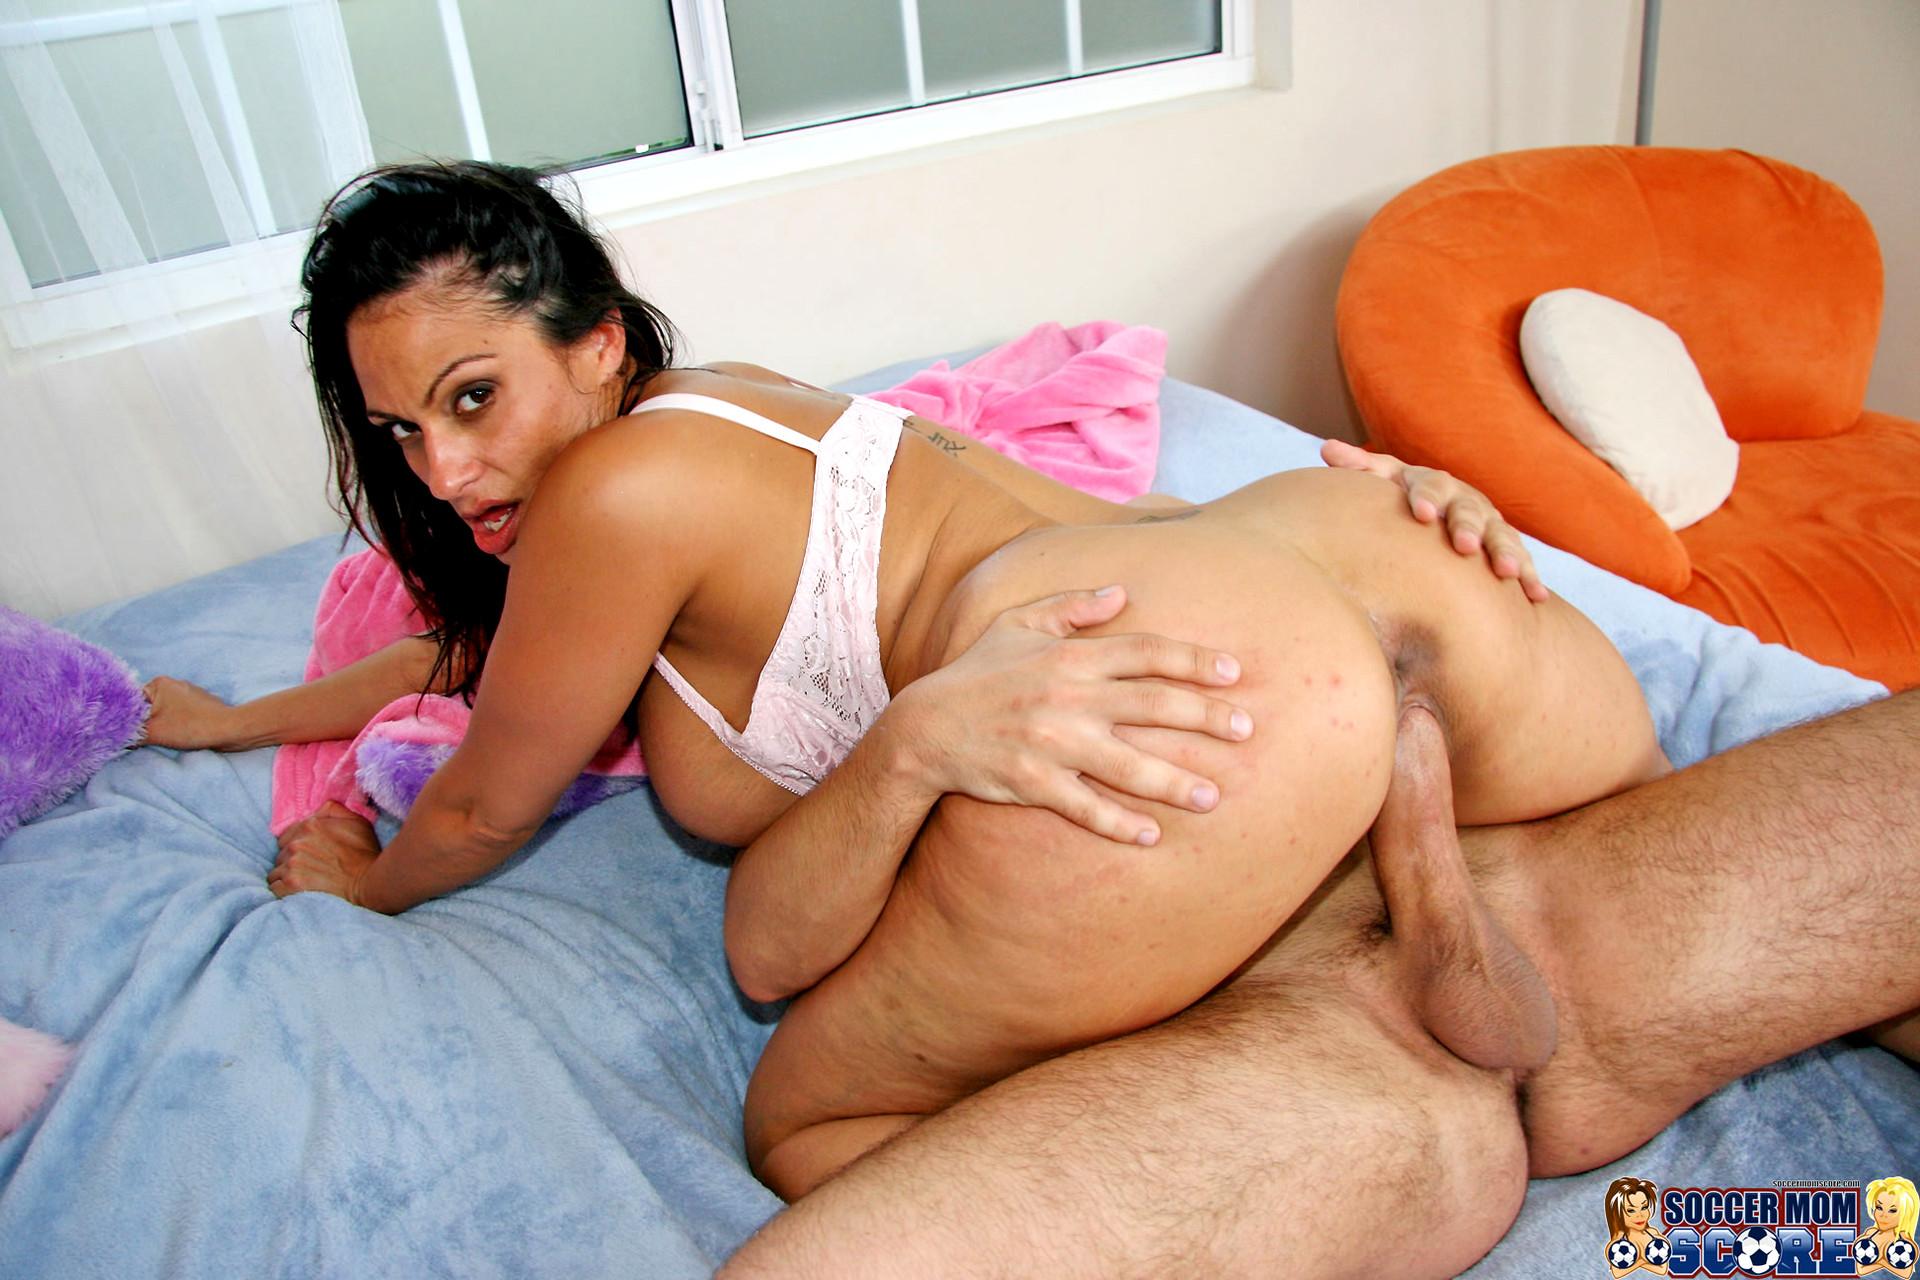 sex-pictures-of-ava-lauren-extreme-hermaphidite-fucking-porn